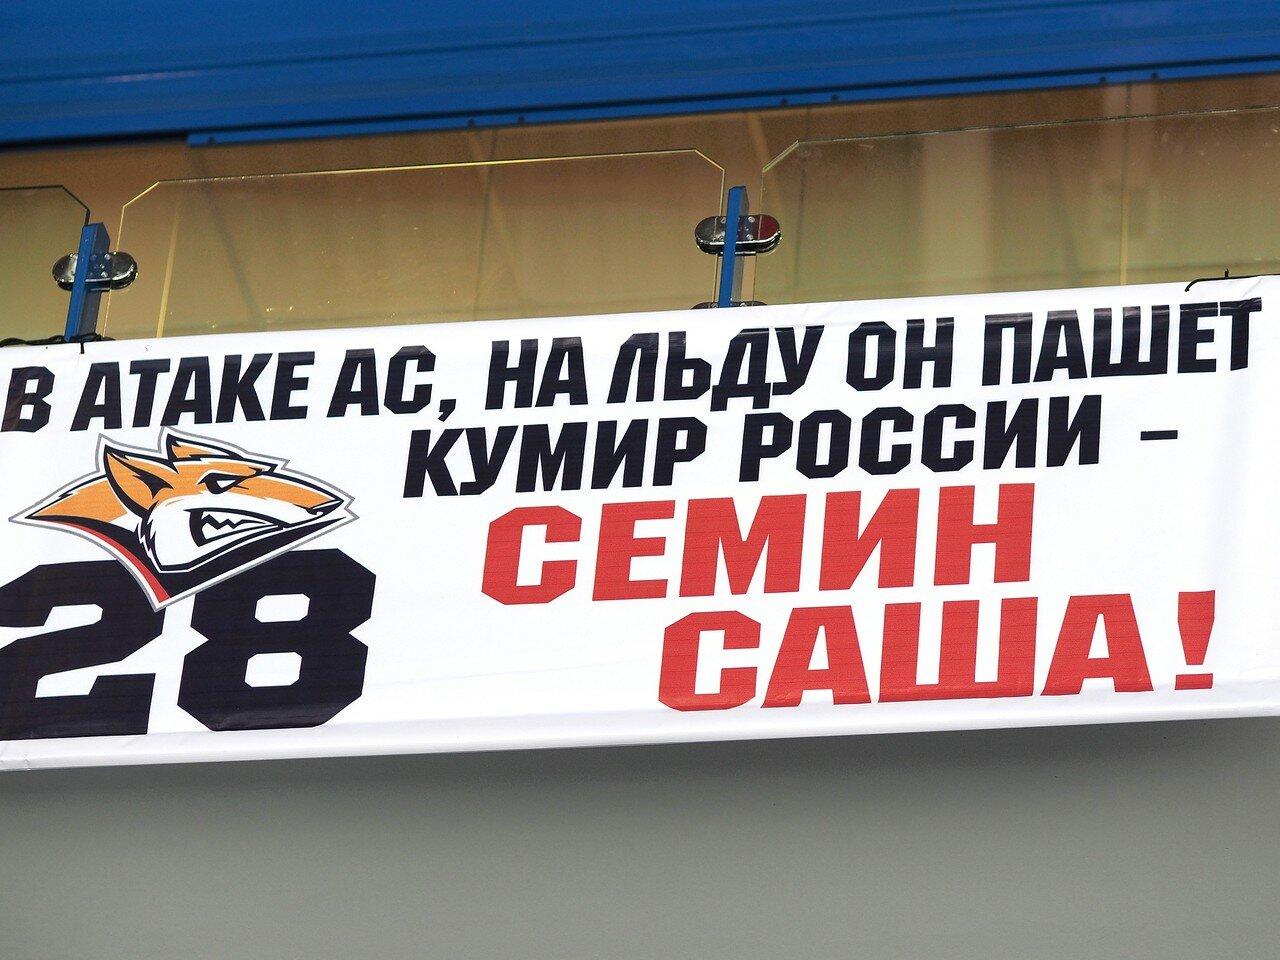 161Восток 1/2 плей-офф Металлург - Сибирь 08.03.2016